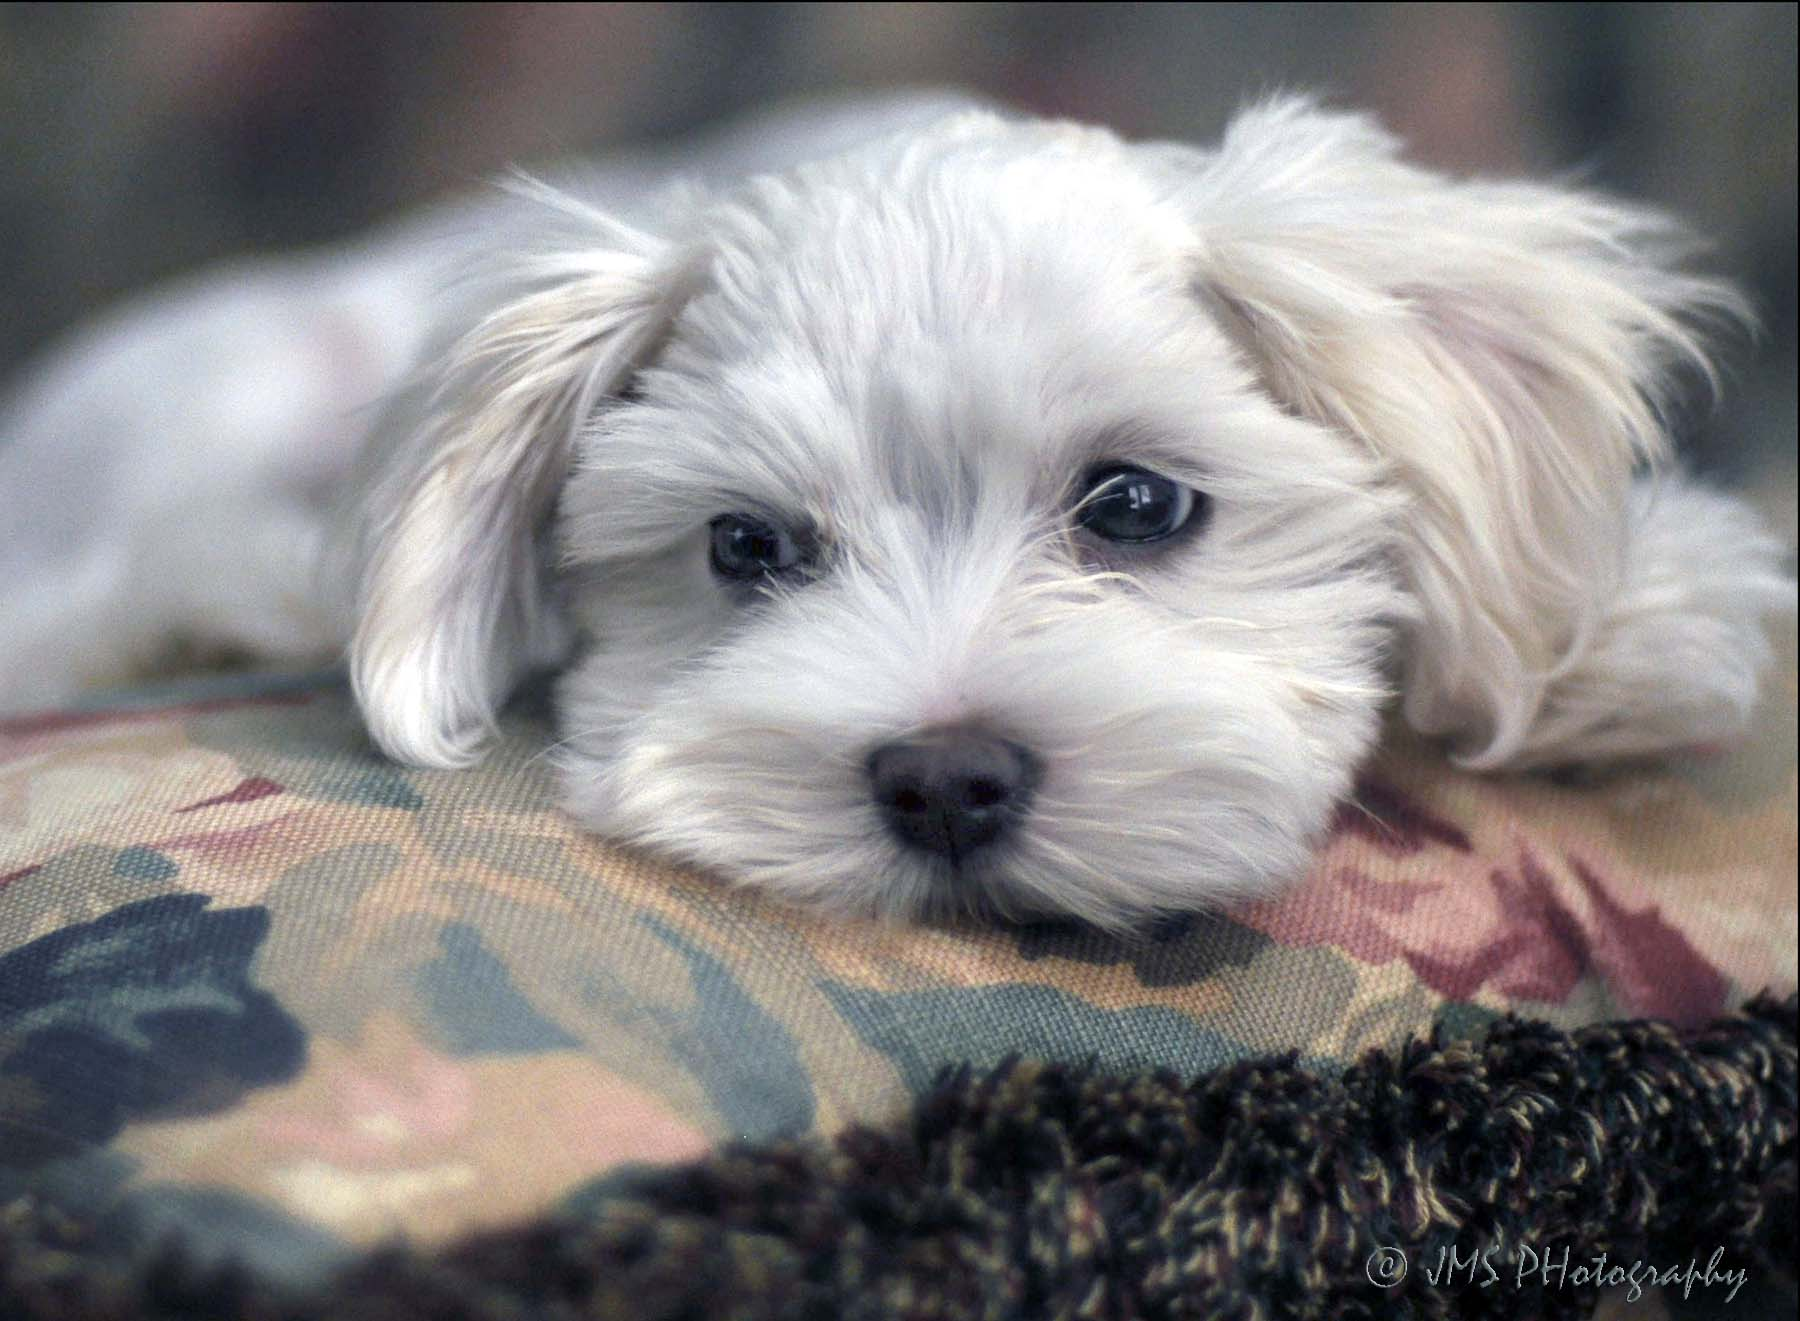 Rascal (a friend's puppy)